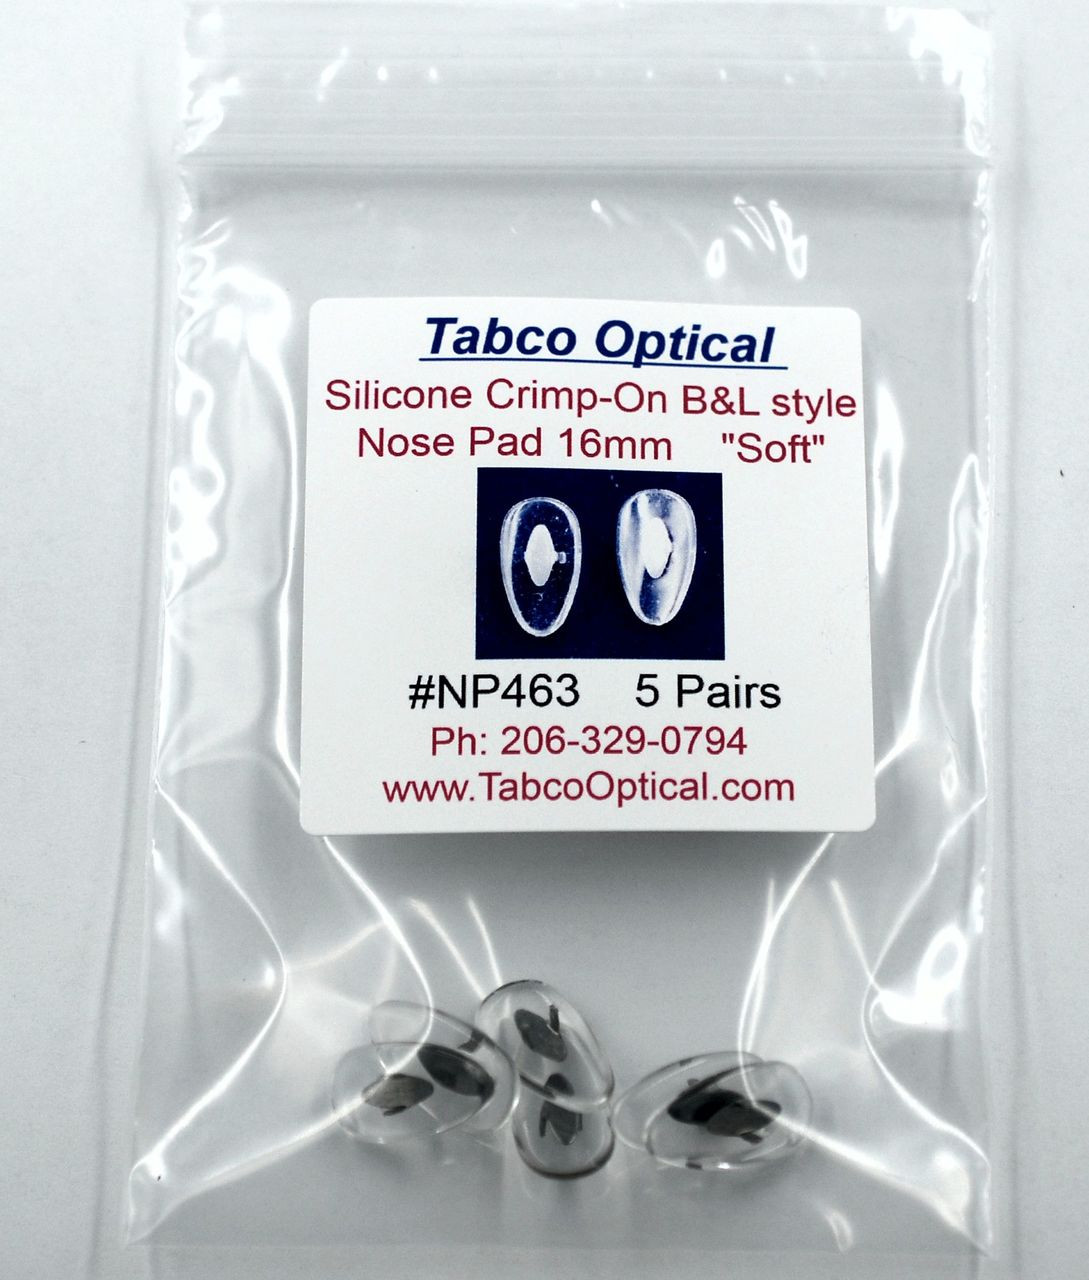 e06d94e3fd ... NP463 Soft Silicone Crimp-On nose pad 16mm length in Tear-drop shape  made